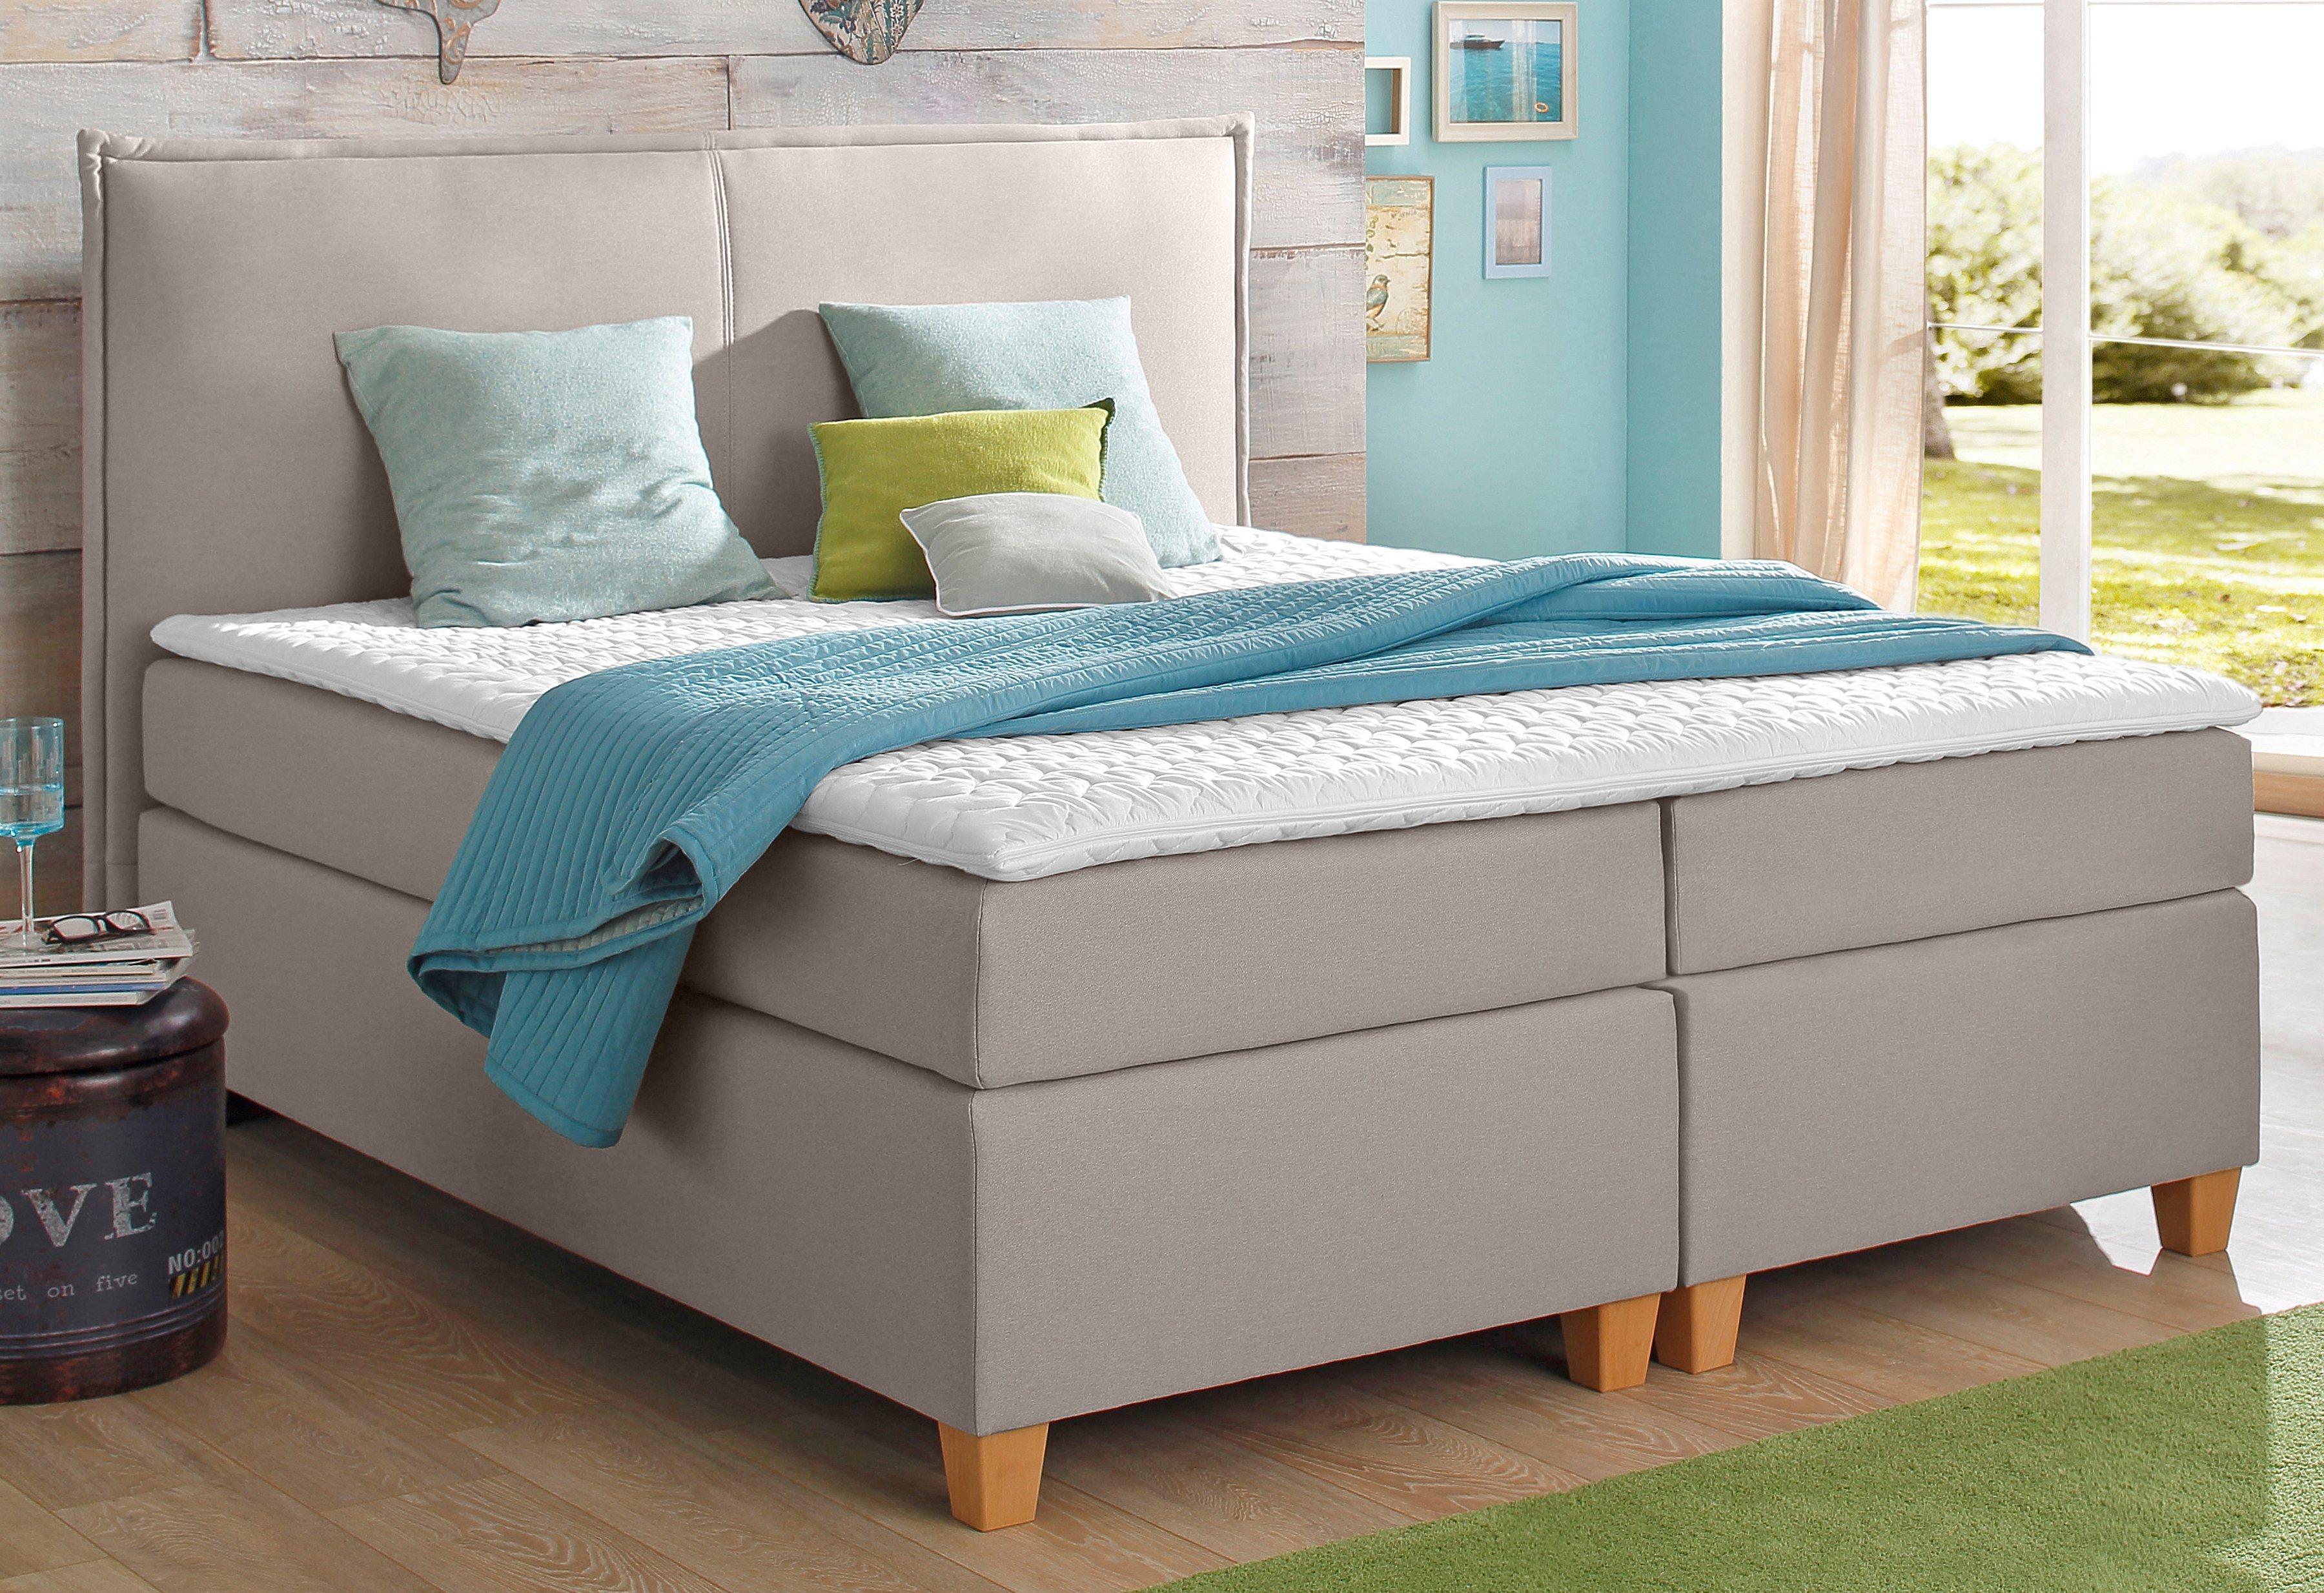 22 sparen boxspringbett maxim von home affaire ab 349 99 cherry m bel. Black Bedroom Furniture Sets. Home Design Ideas